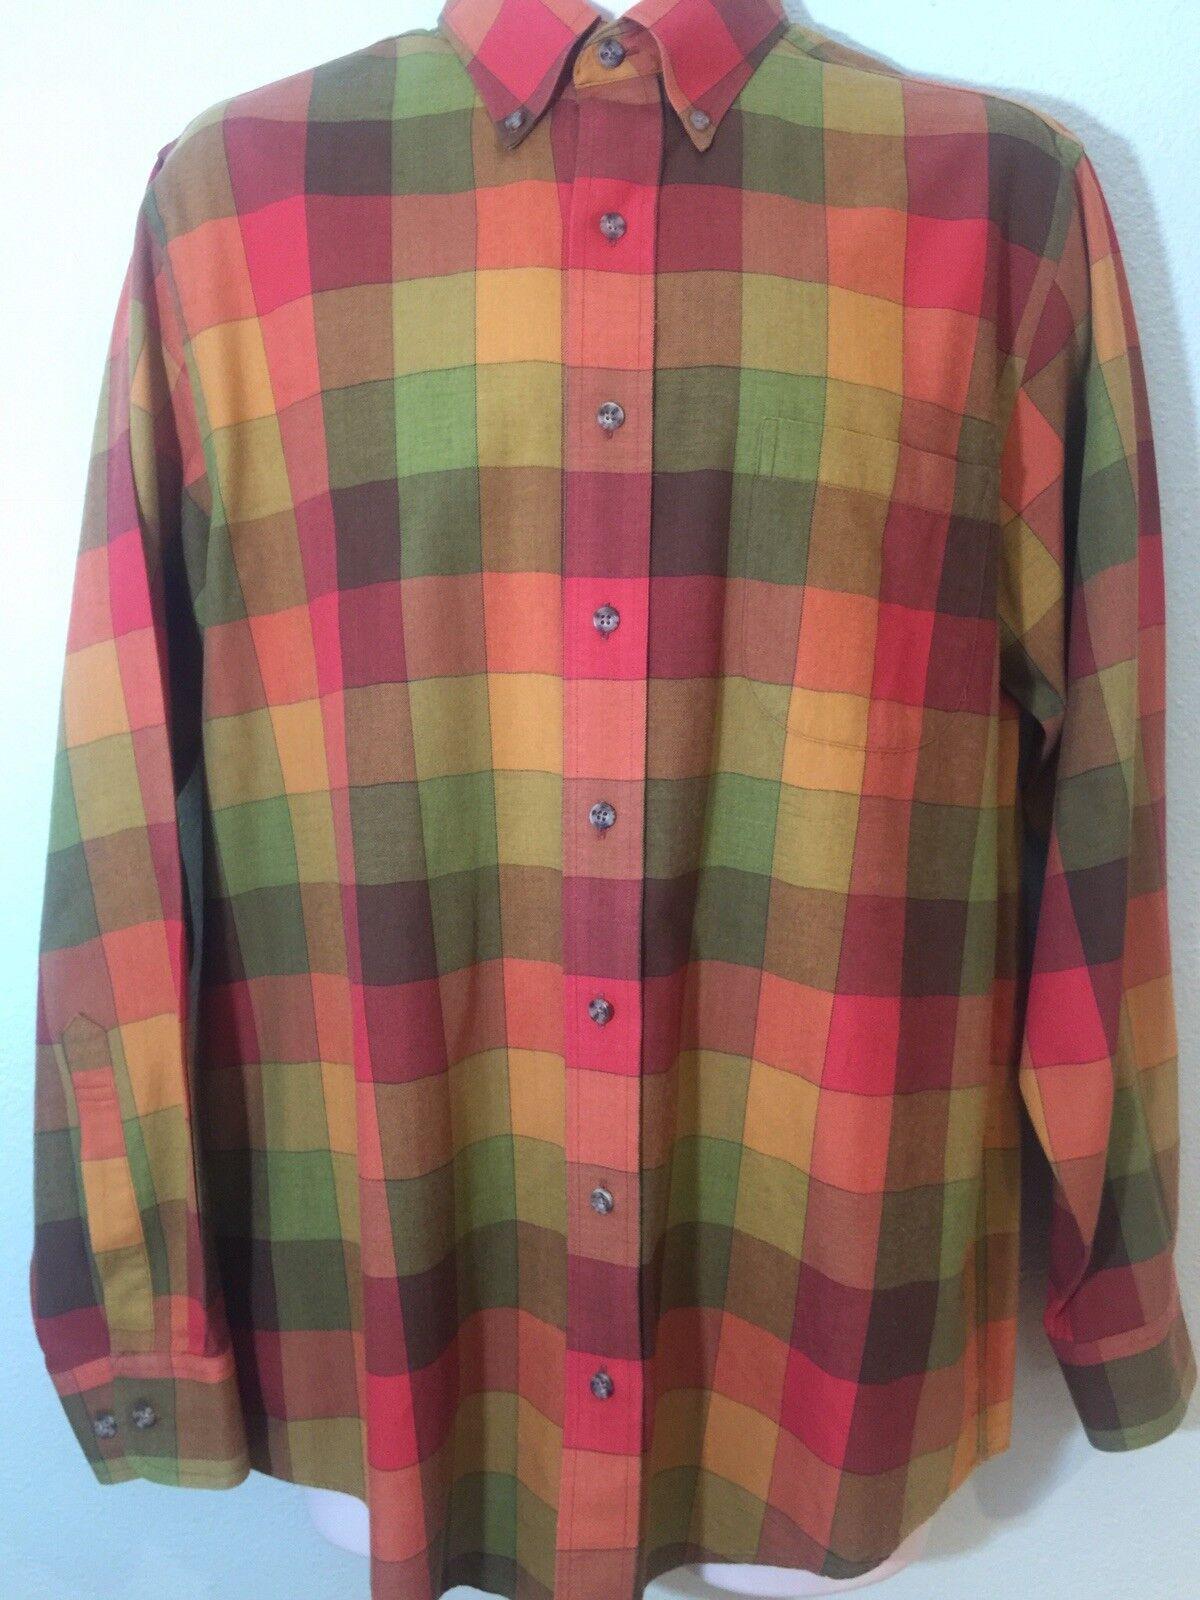 VIYELLA Men's Bright Plaid Wool Cotton Long Sleeve Shirt Size M Excellent